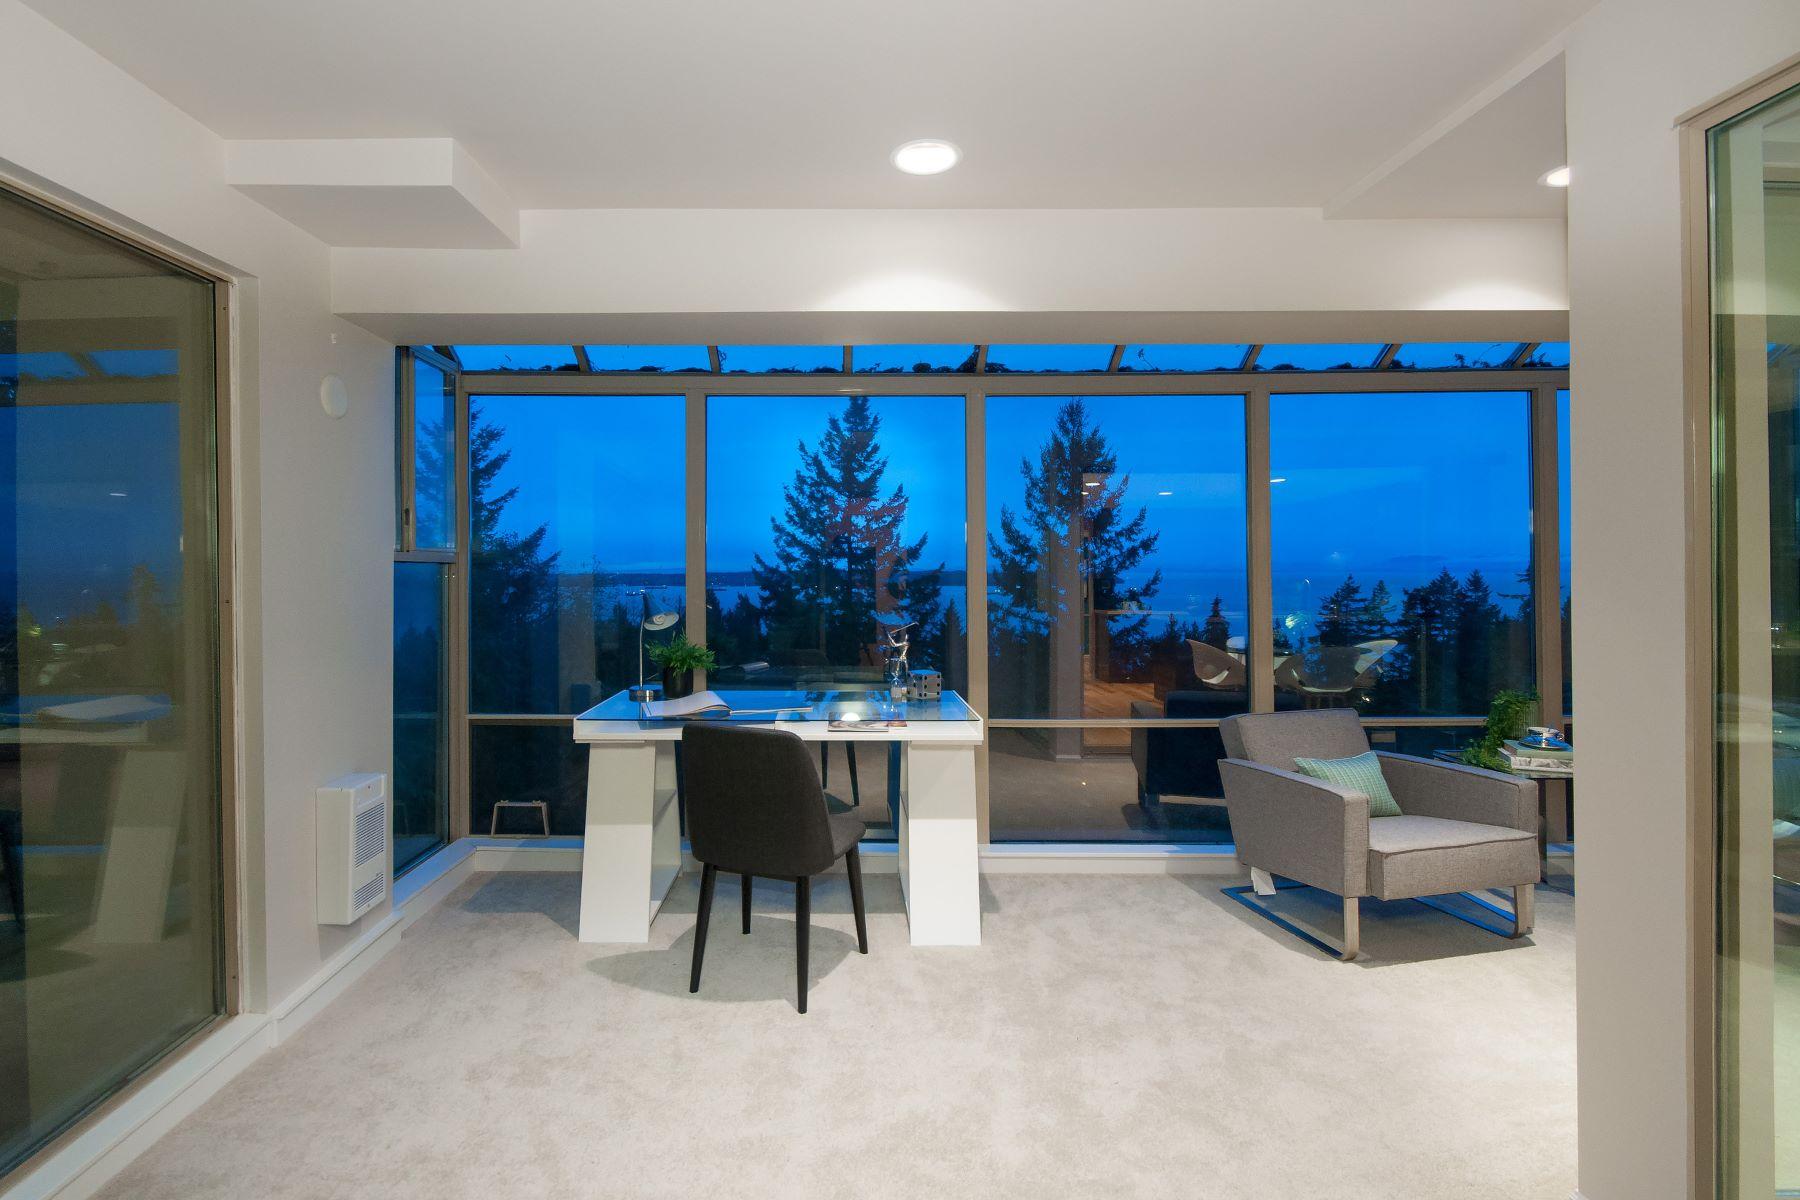 Casa unifamiliar adosada (Townhouse) por un Venta en Panoramic Ocean Views 3010 Deer Ridge Close, West Vancouver, British Columbia, V7S 4W1 Canadá